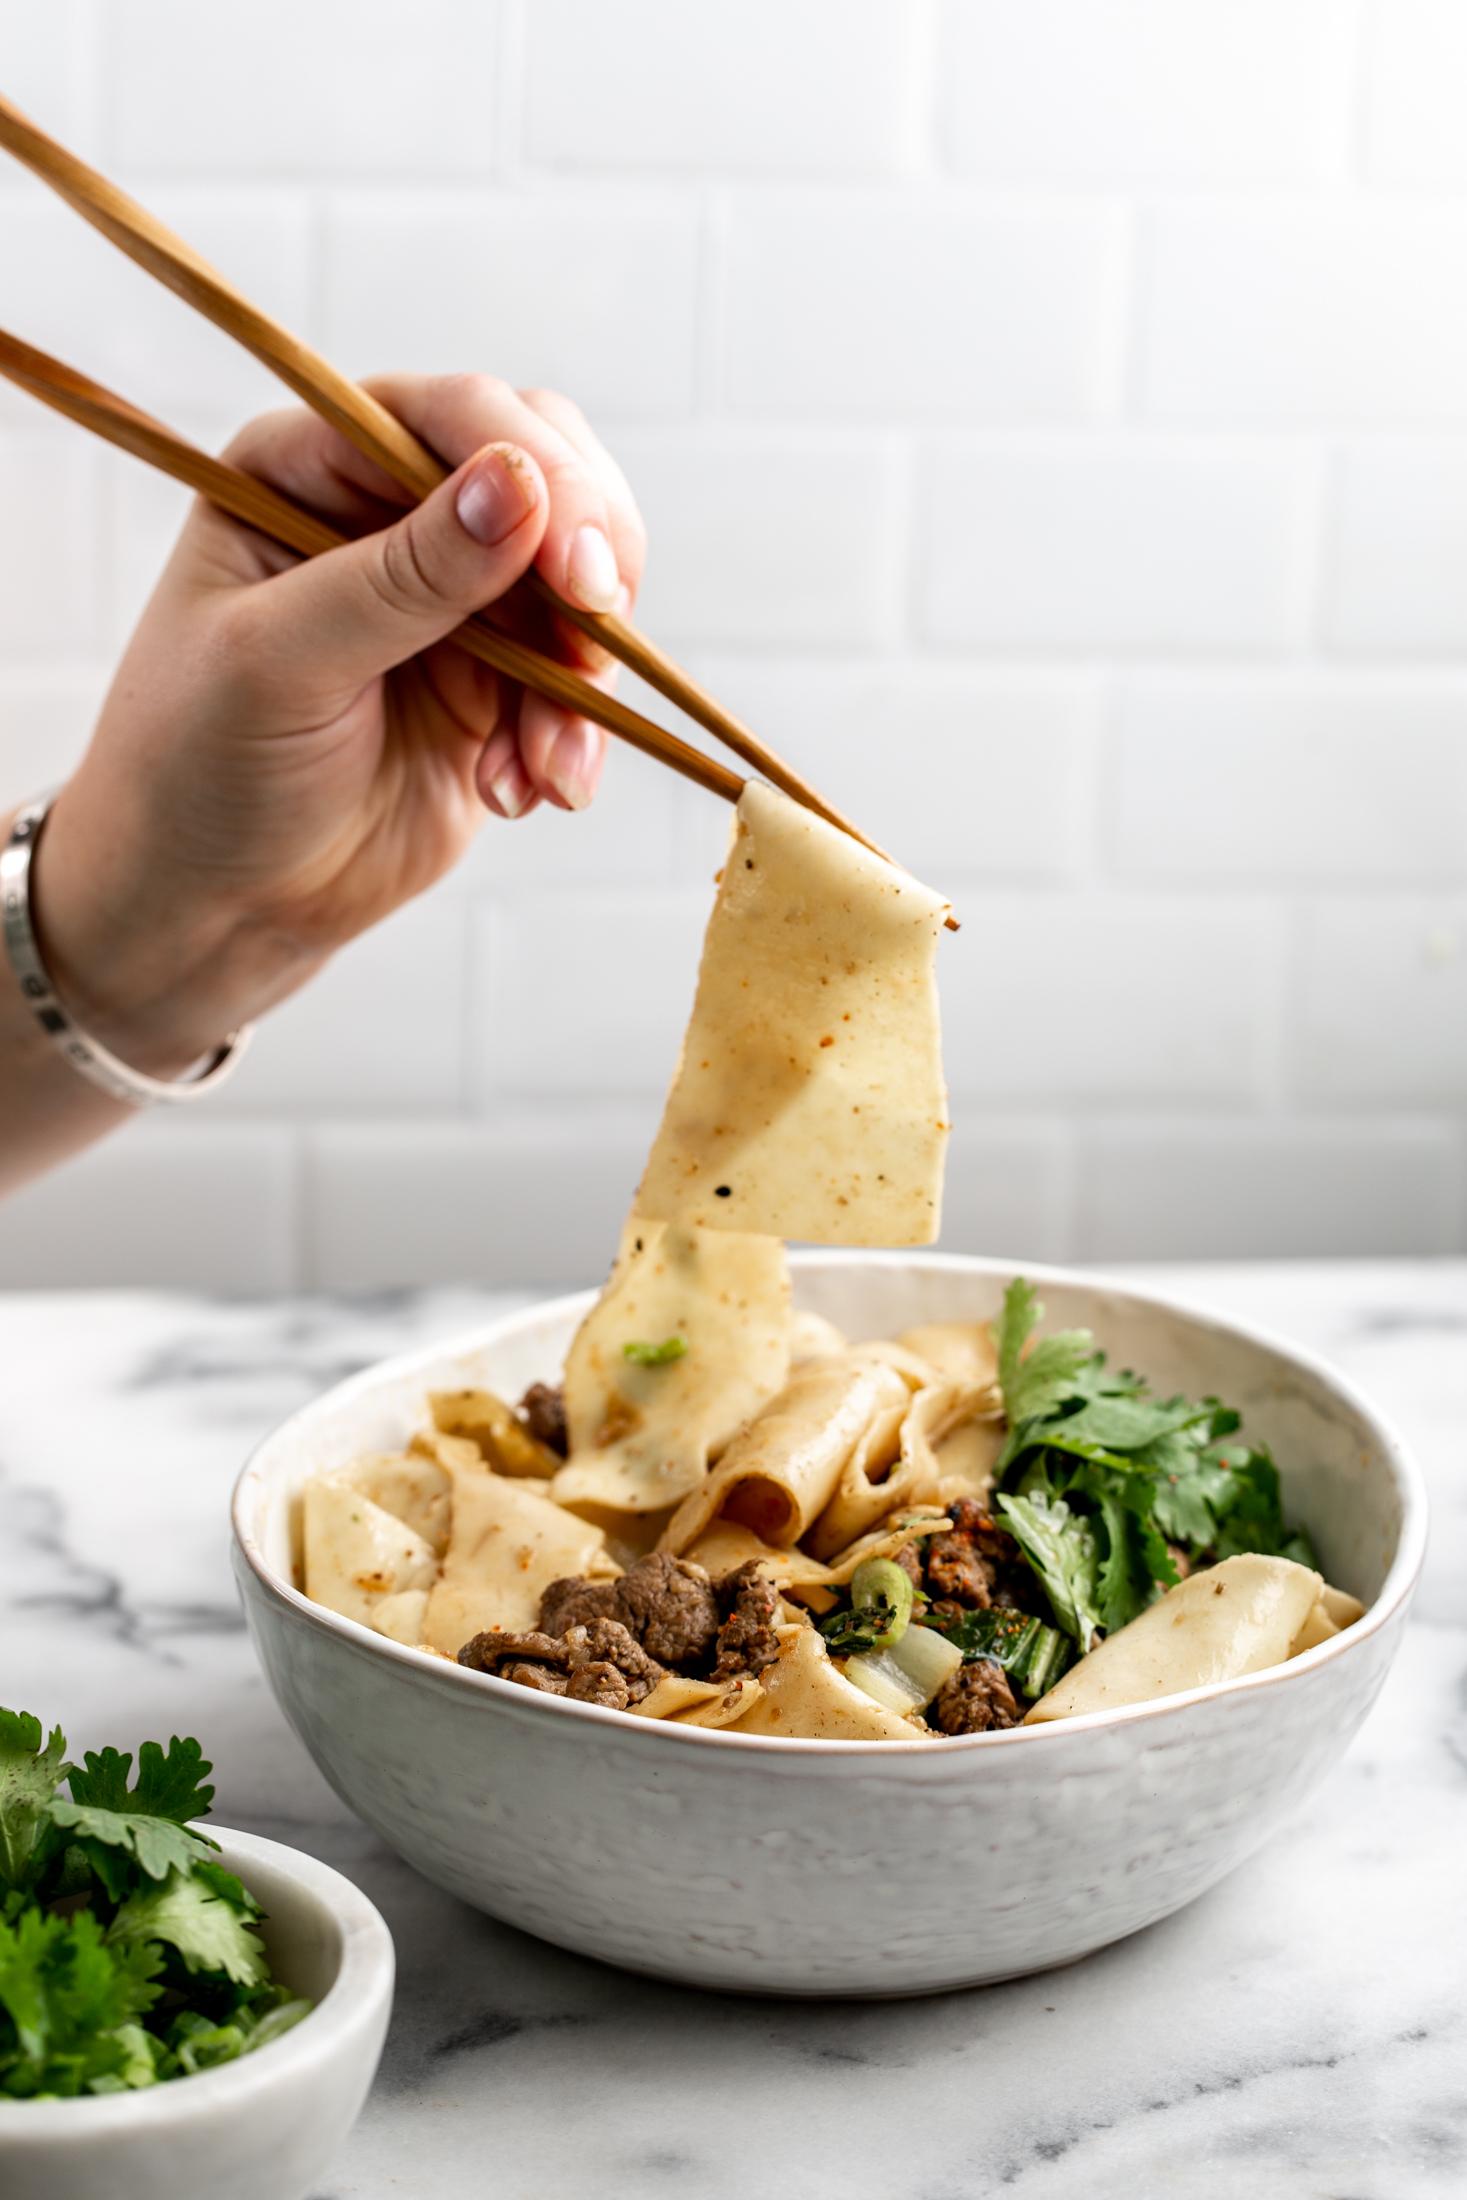 Sichuan-Style Spicy Cumin Lamb Noodles-7.jpg